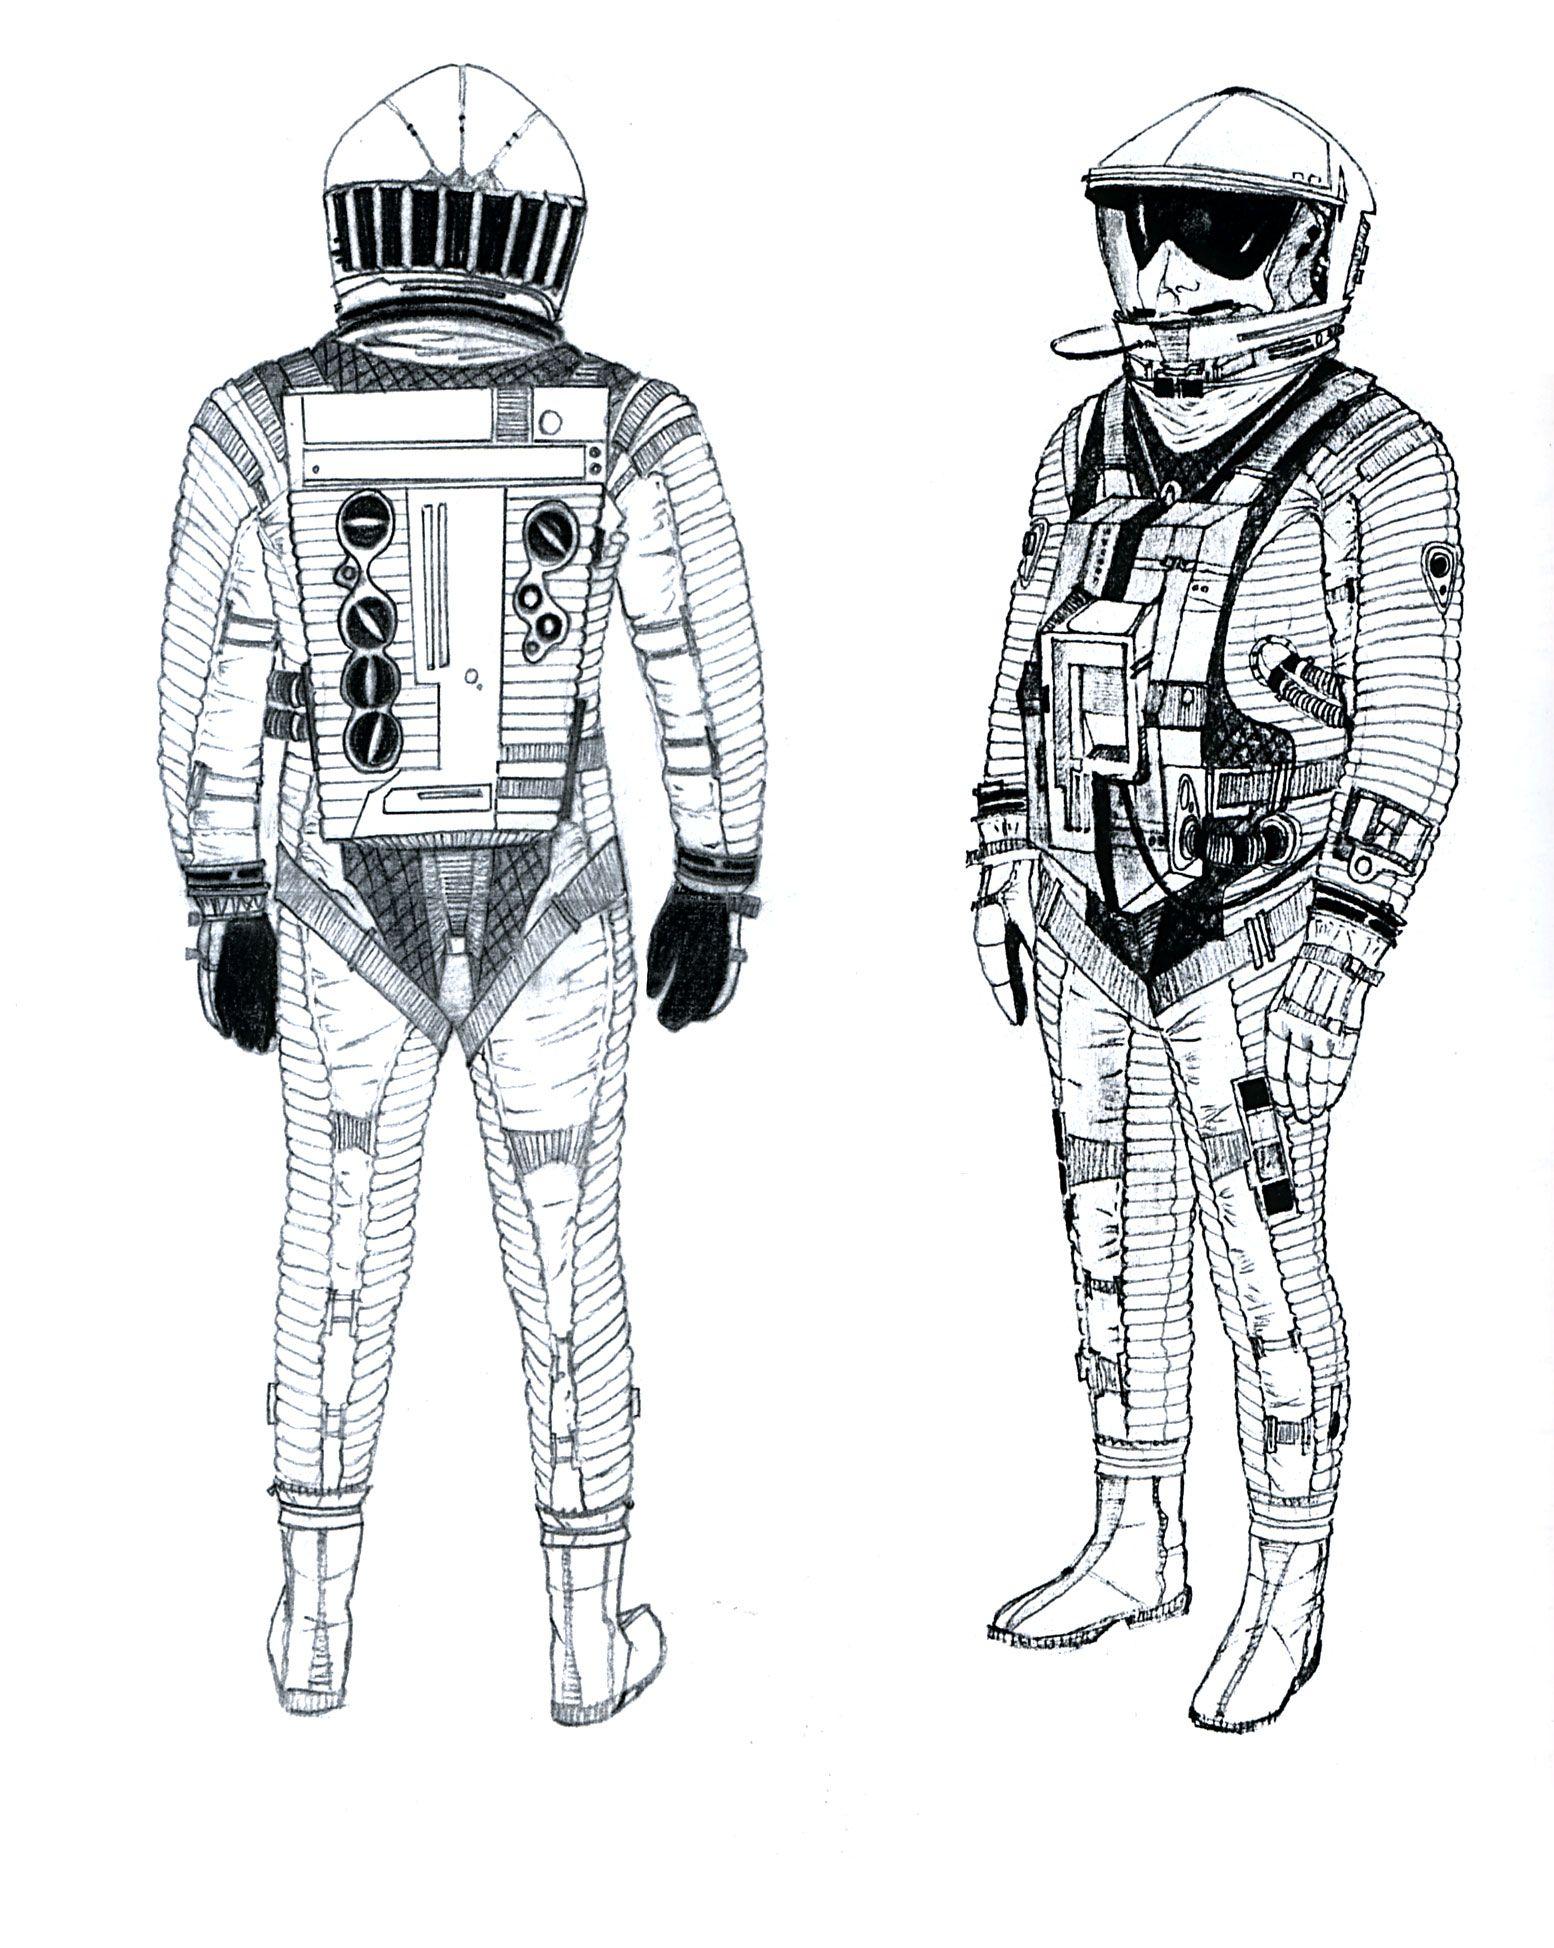 retro space suits - photo #6